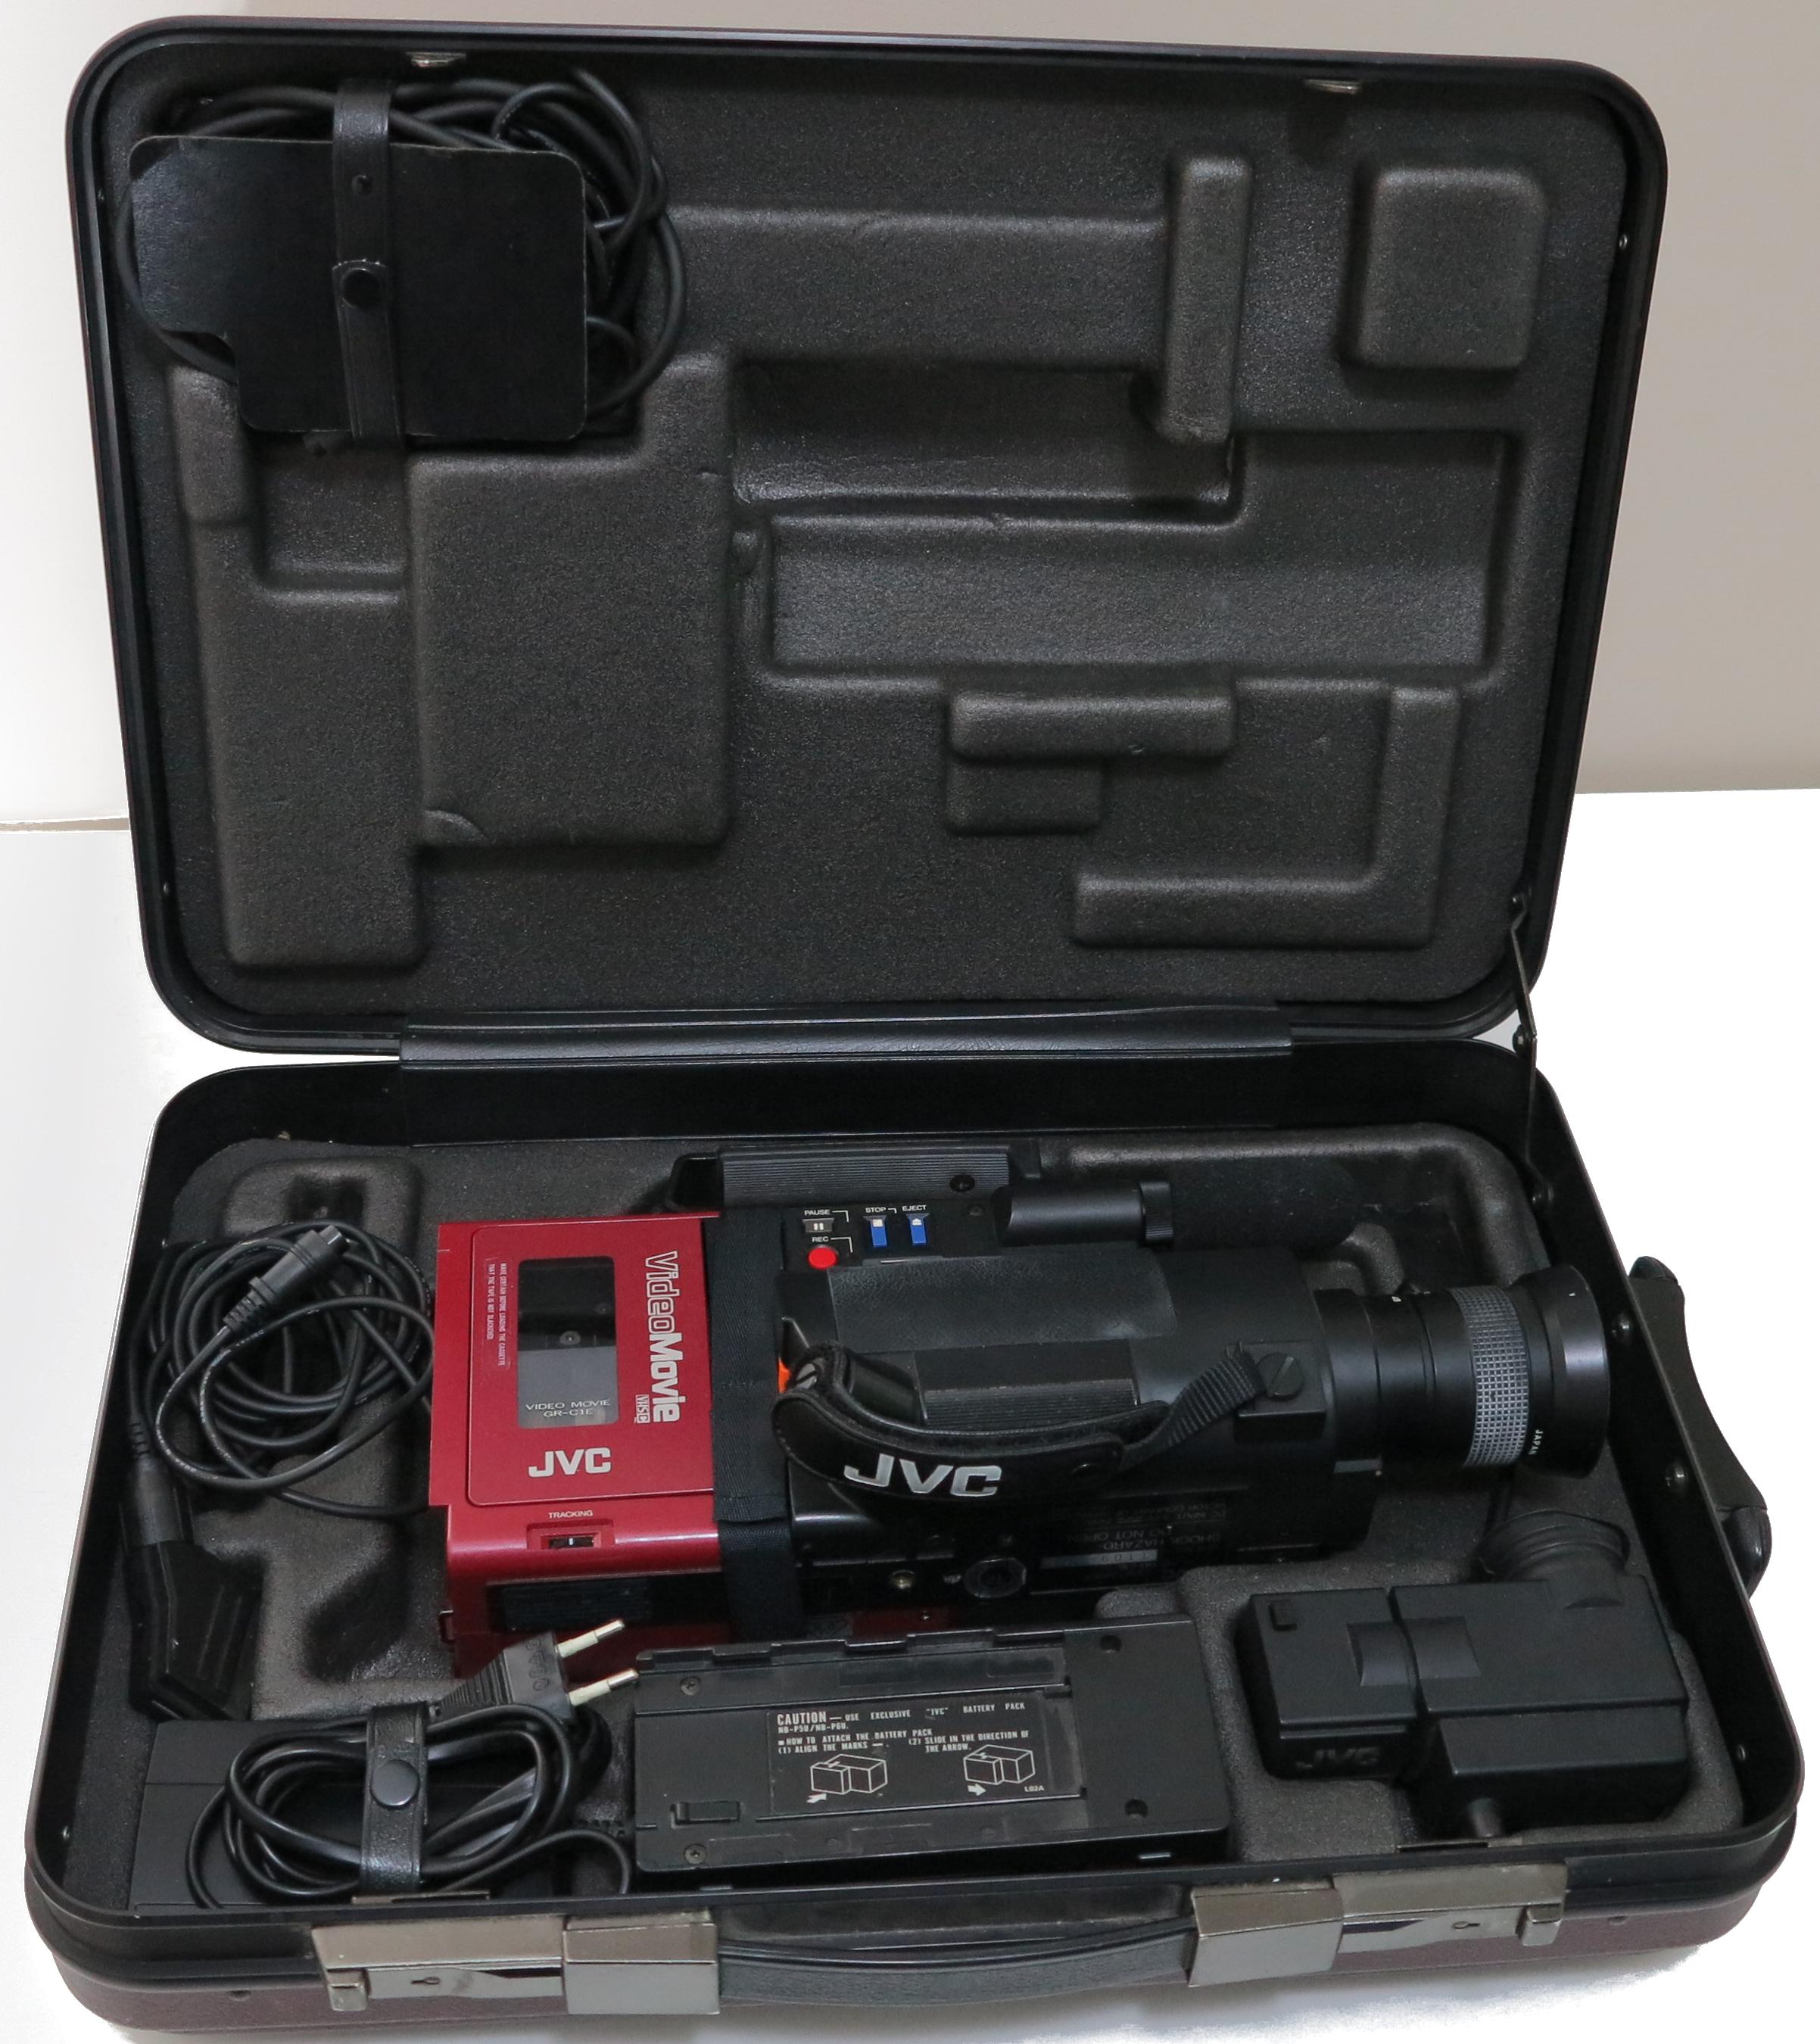 JVC GR-C1 i koffert